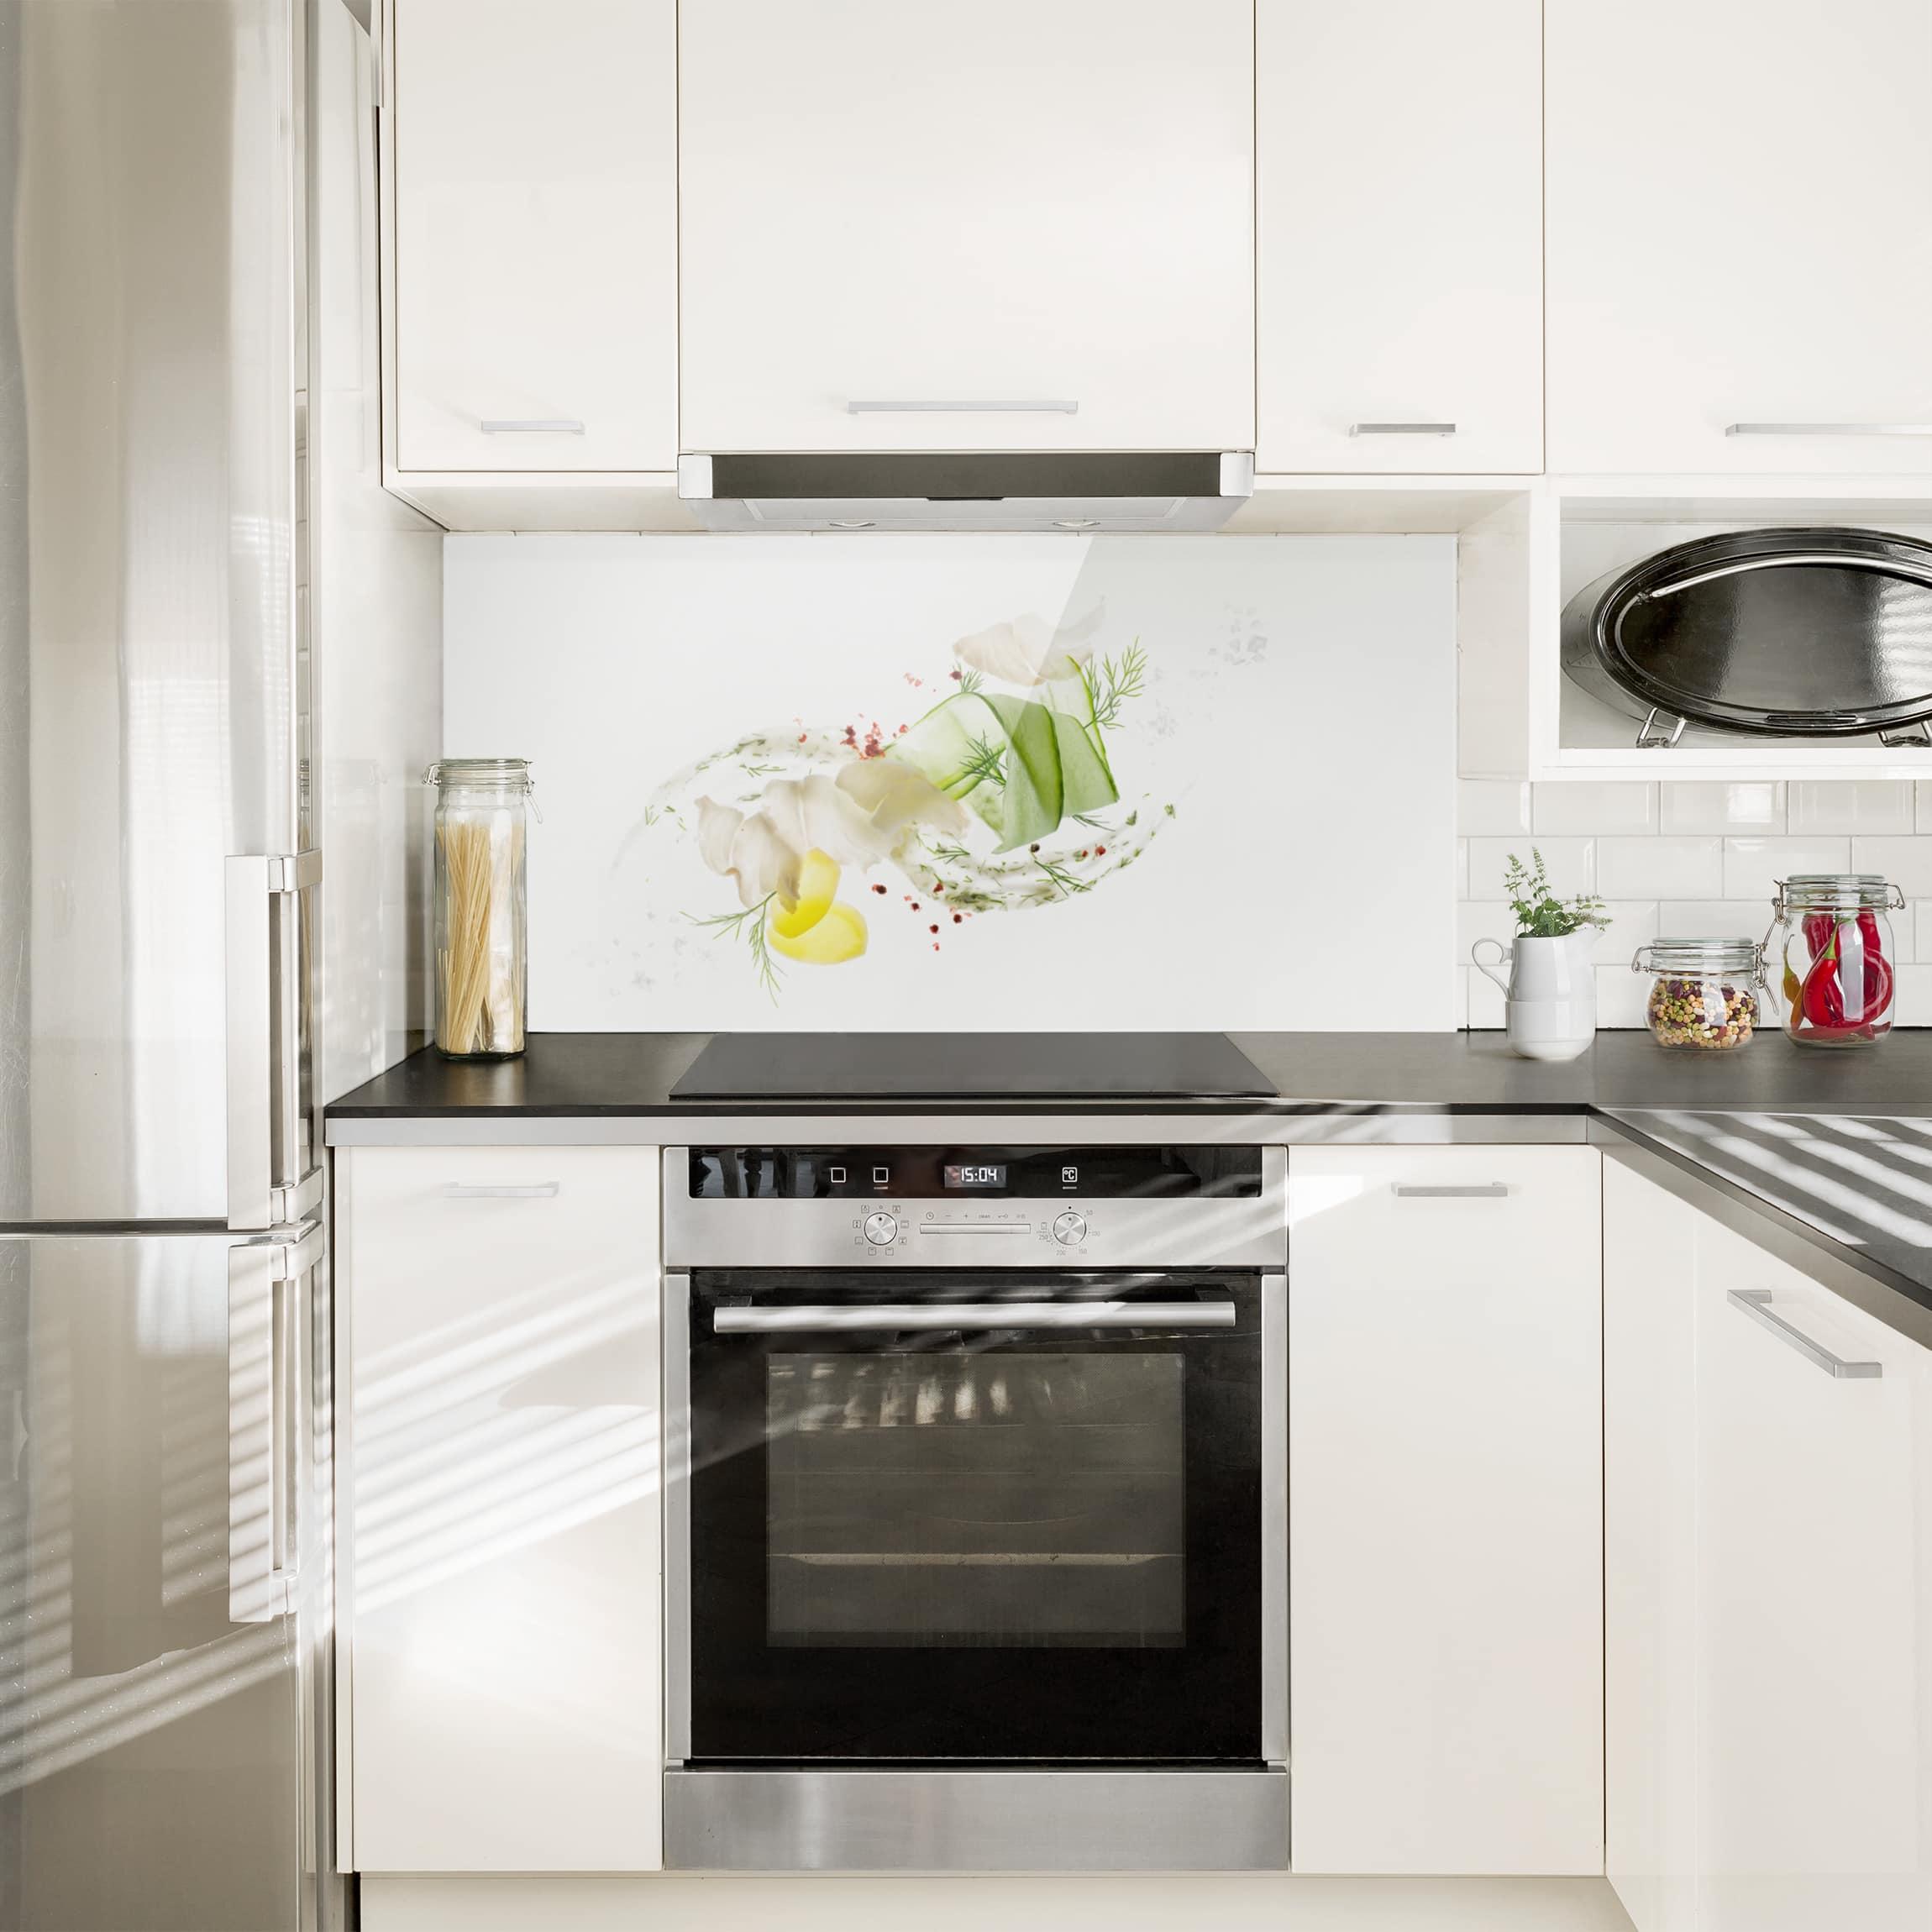 spritzschutz glas fischkreation quer 1 2. Black Bedroom Furniture Sets. Home Design Ideas